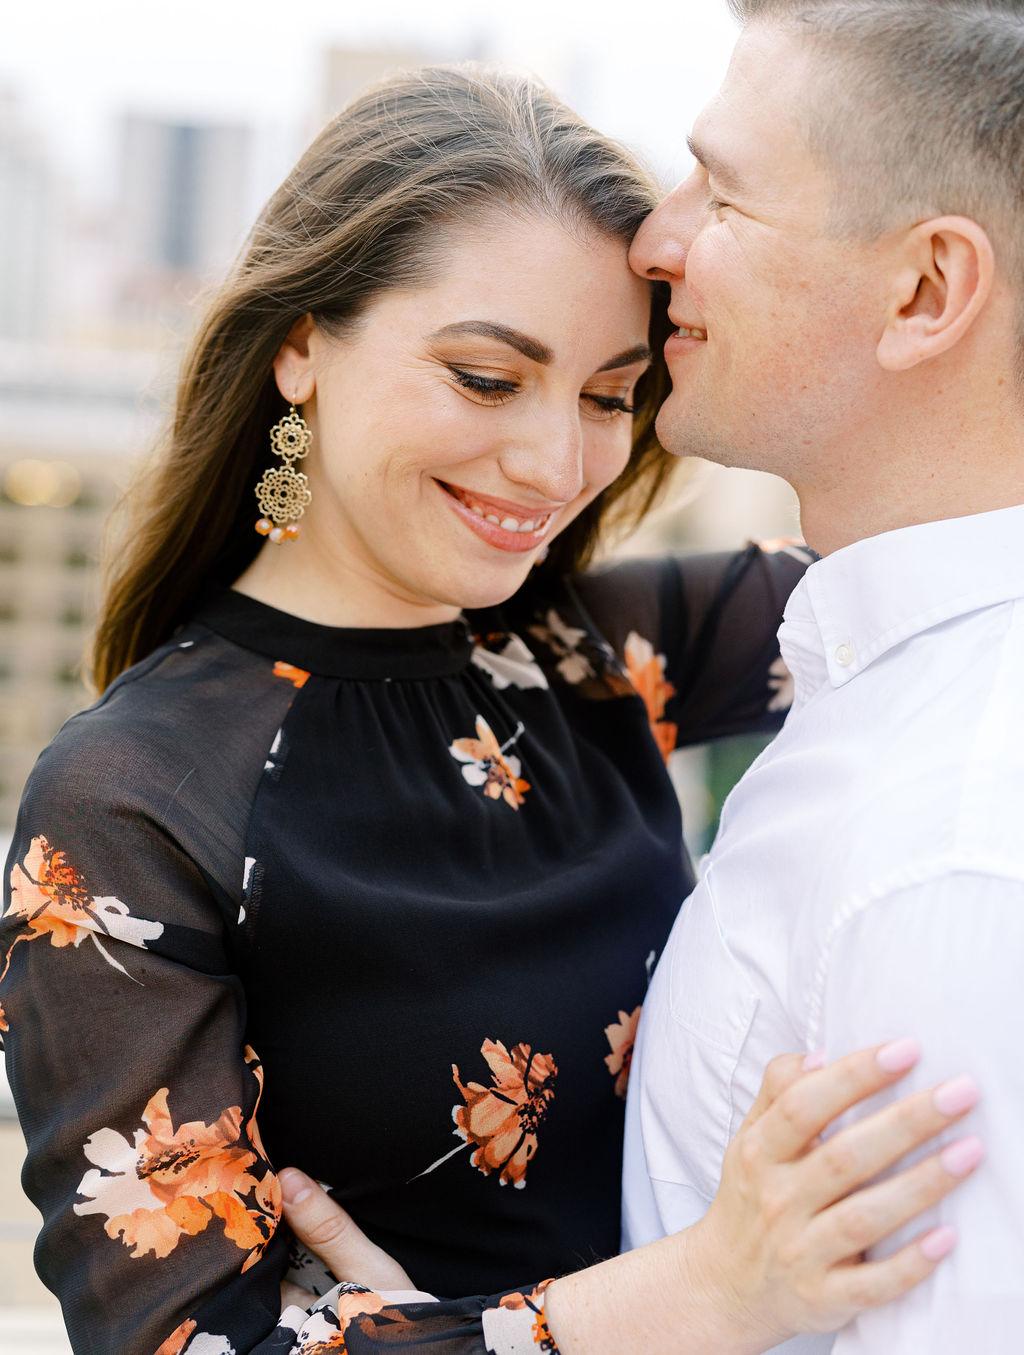 Austin-Intimate-Wedding-Elopement-Photograper-Film-Downtown-Engagement-Session-San-Antonio-Riverwalk-36.jpg